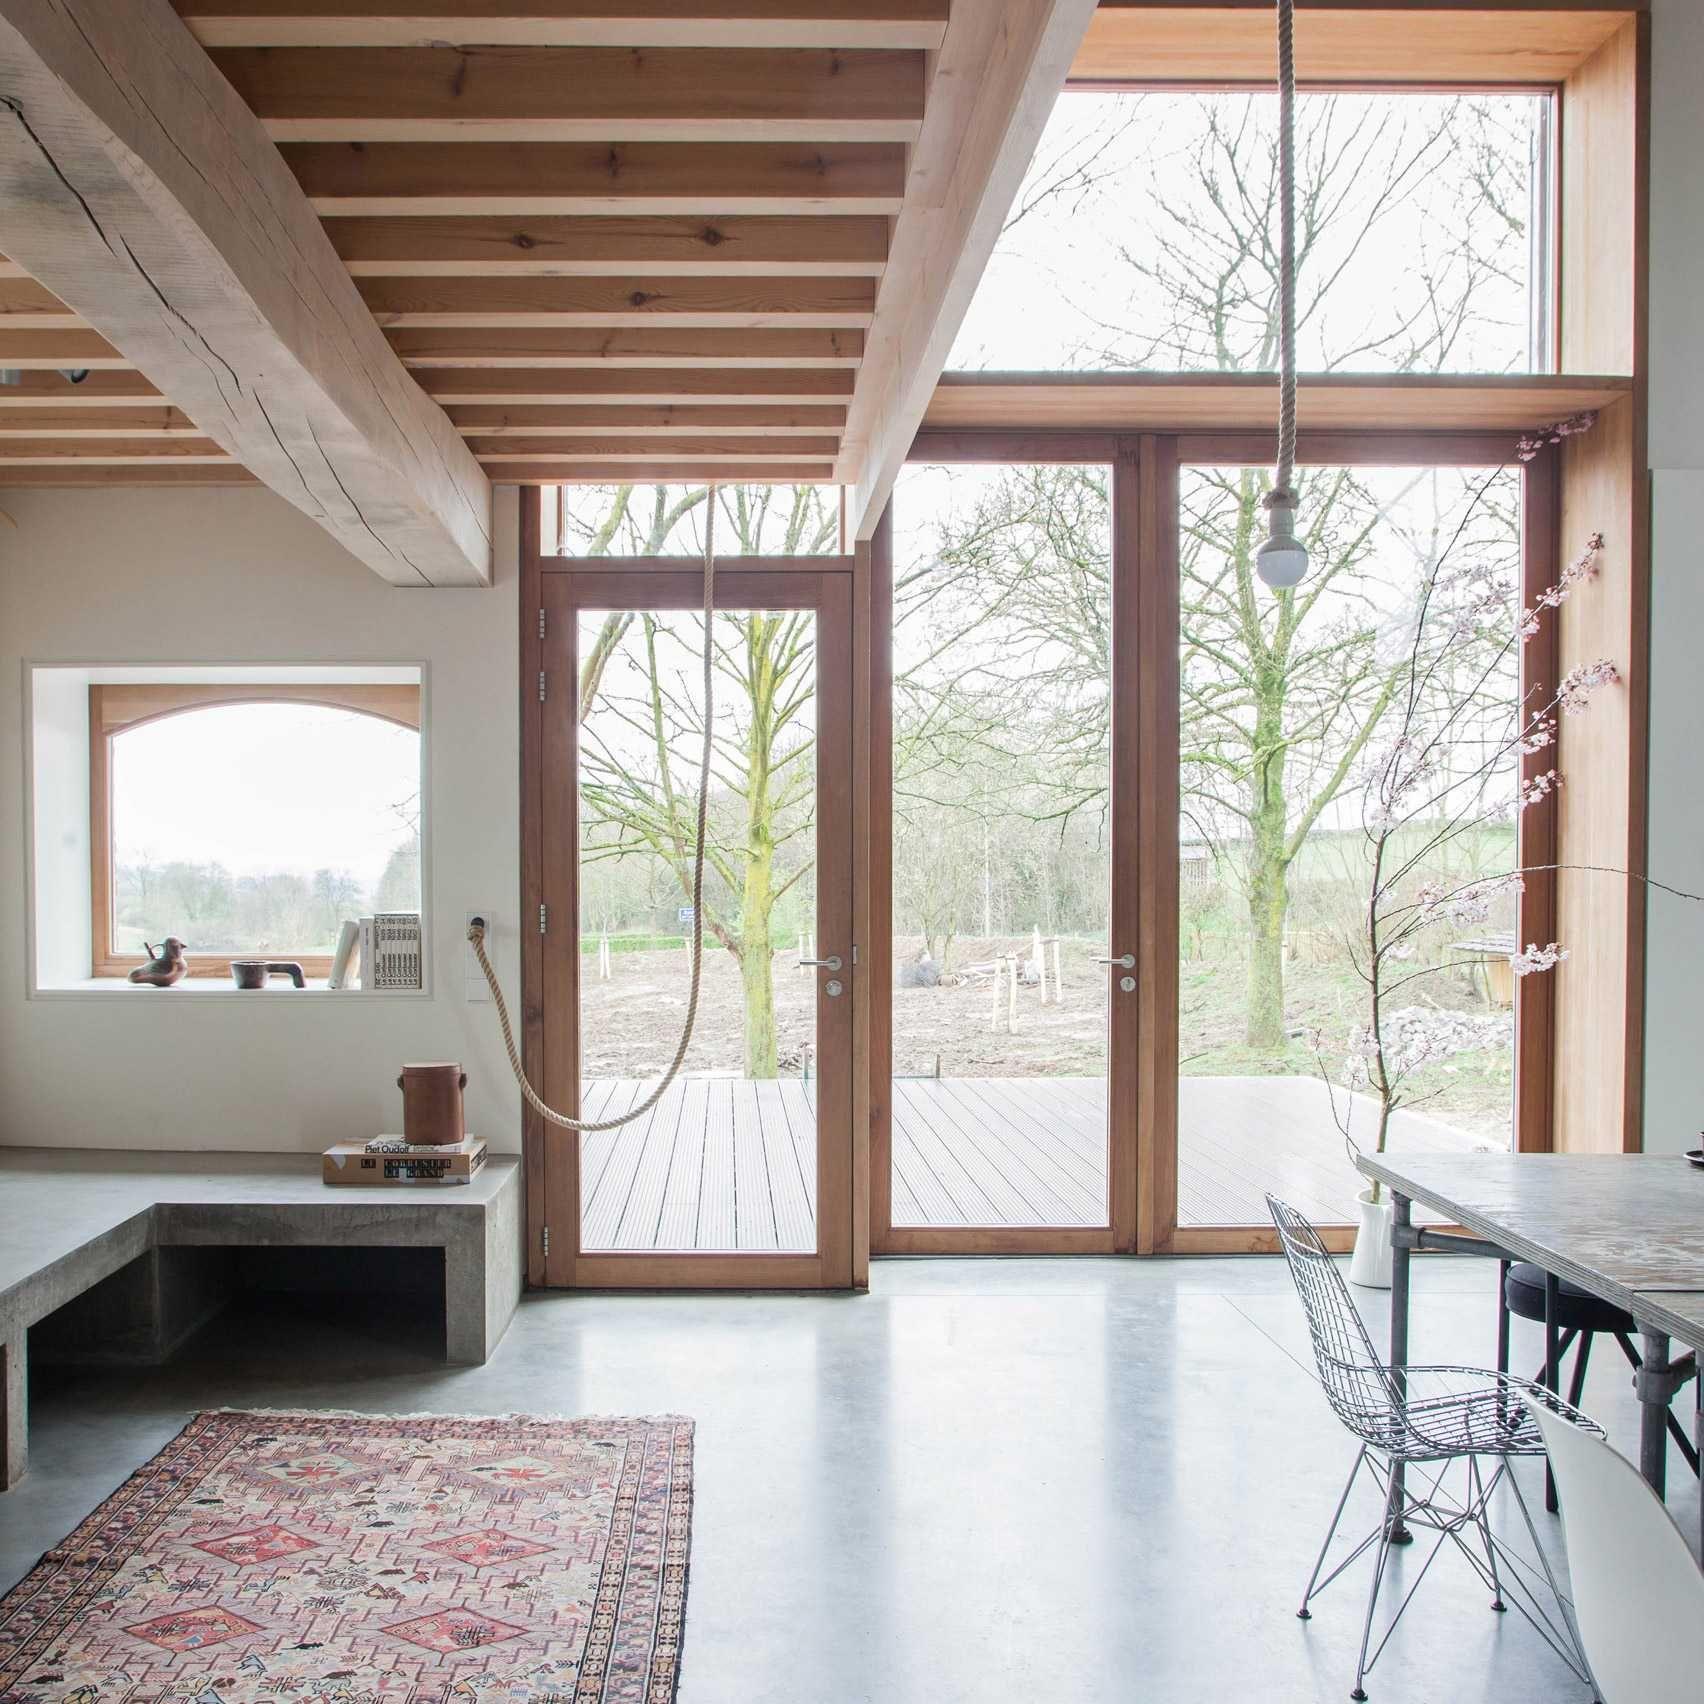 Luxury Farmhouse Interior Design: Beautiful Norwegian Farmhouse Interior